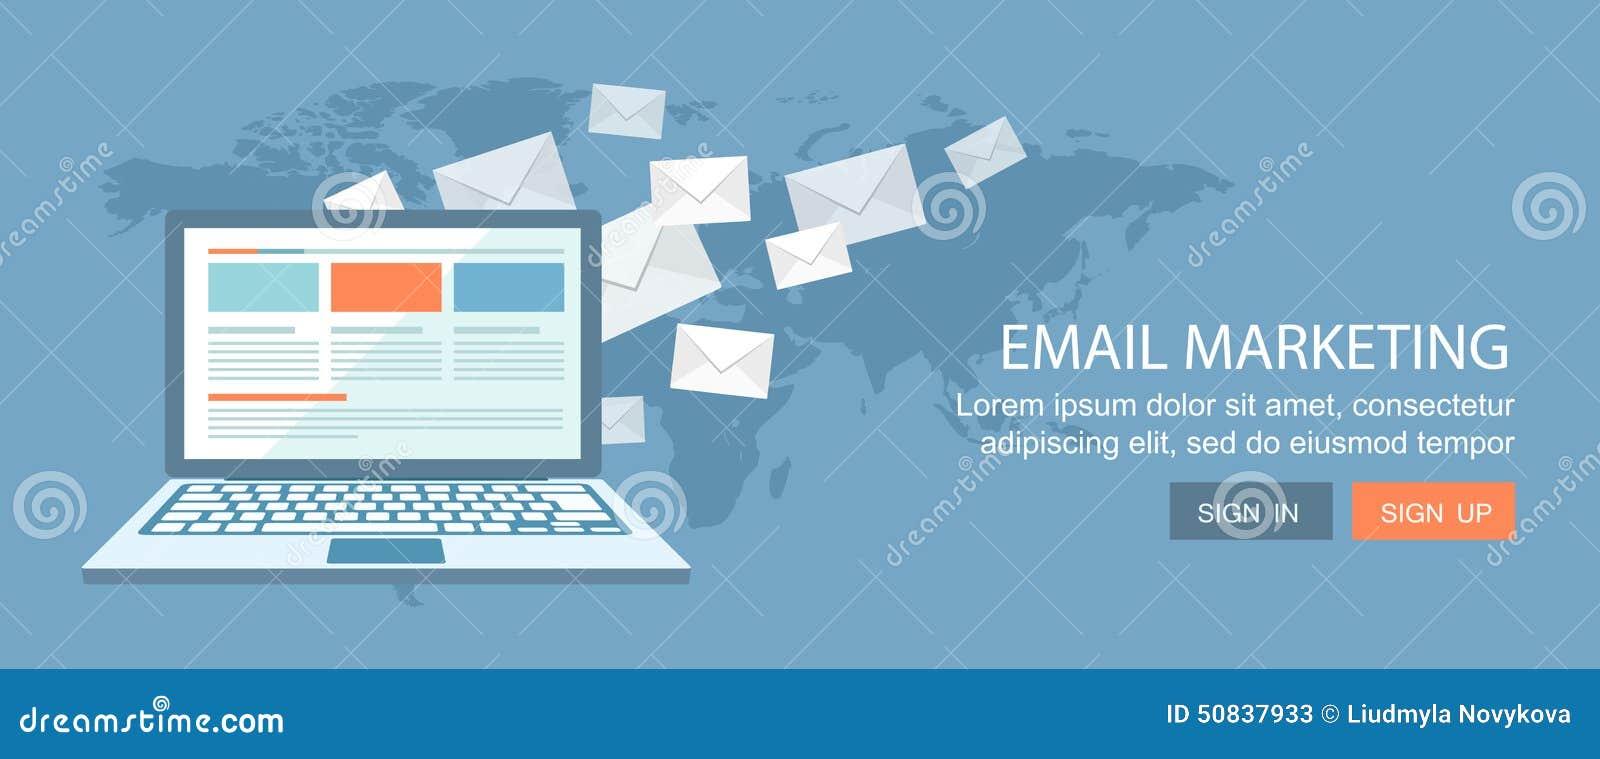 Vlakke bannerreeks Internet-handel en e-mail marketing illustrati